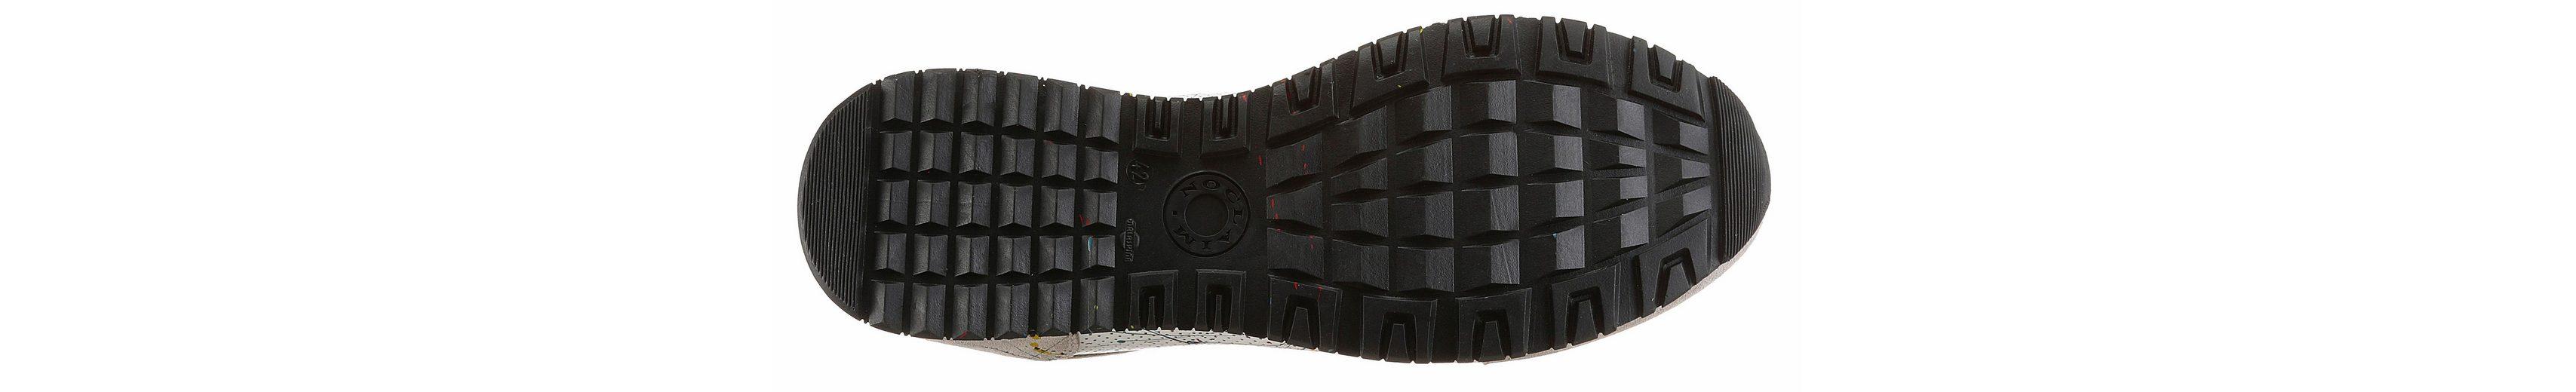 handbemalt Racy Sneaker NOCLAIM Unikat Paar ein NOCLAIM jedes 12 Racy OwqTPRXn4x